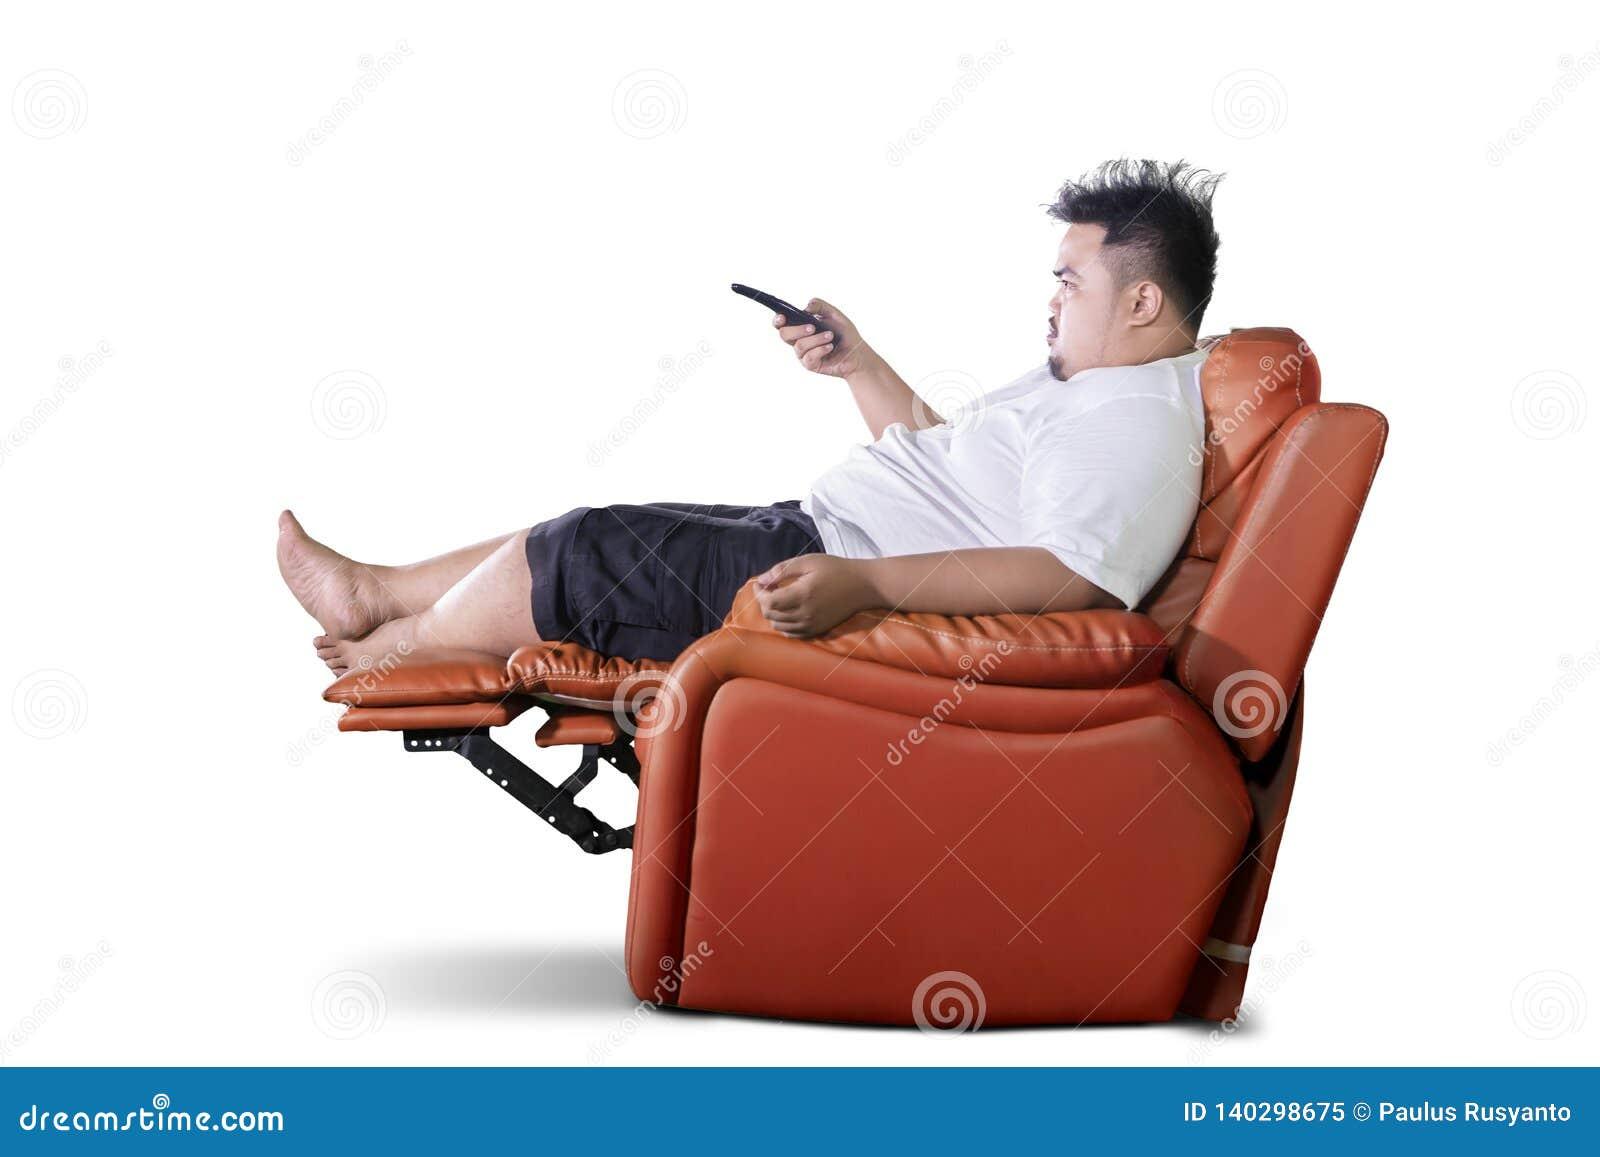 Awe Inspiring Asian Obese Man Watching Television On Studio Stock Image Creativecarmelina Interior Chair Design Creativecarmelinacom